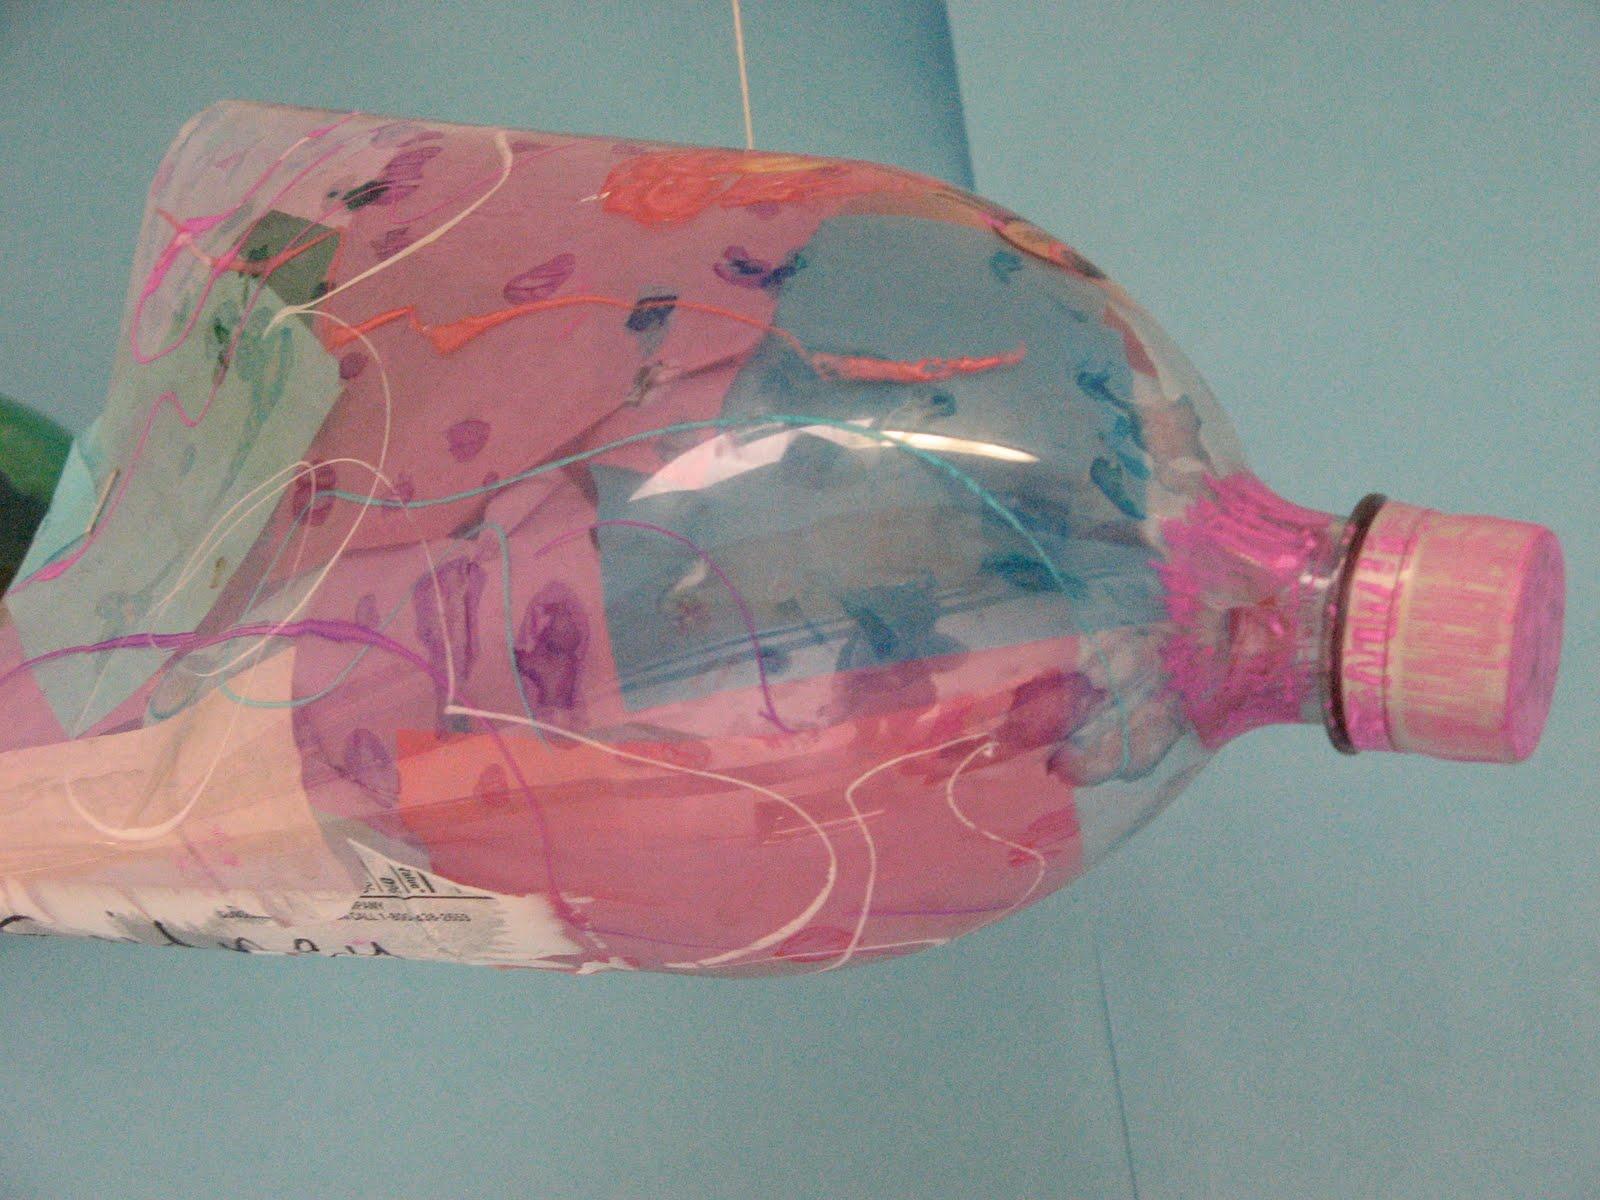 we used 2 liter bottles to